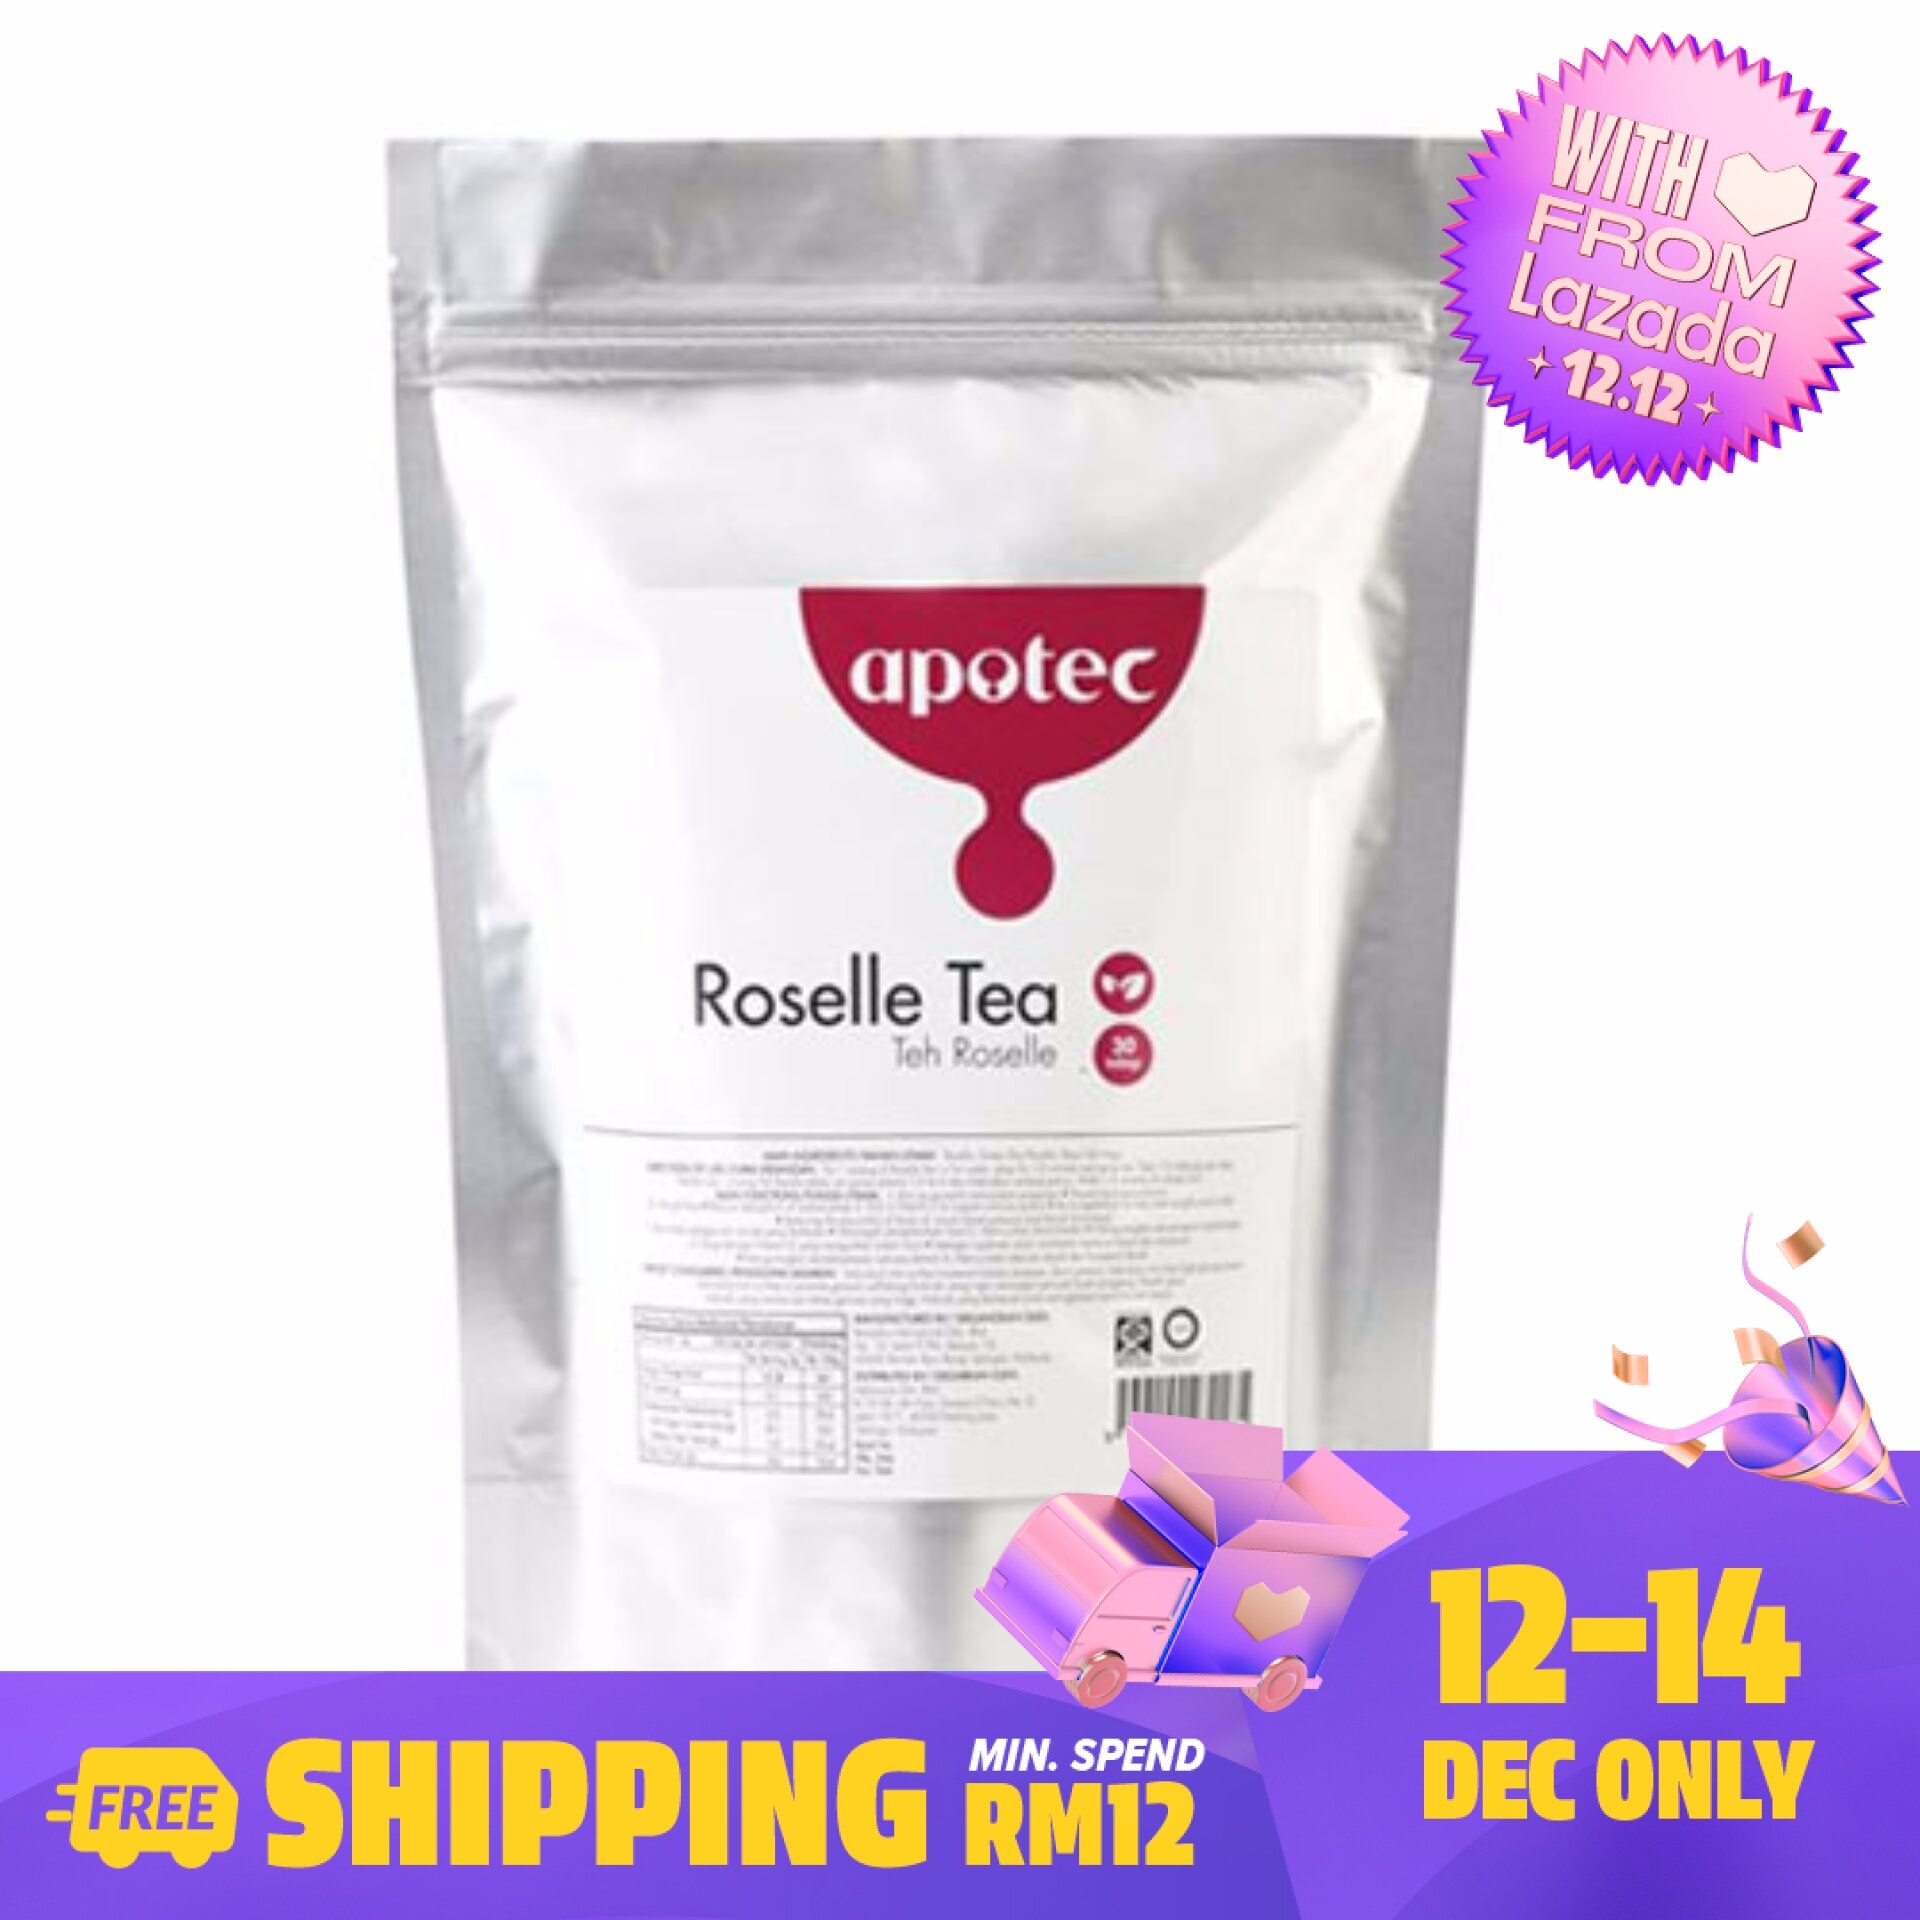 Apotec Roselle Tea 30's